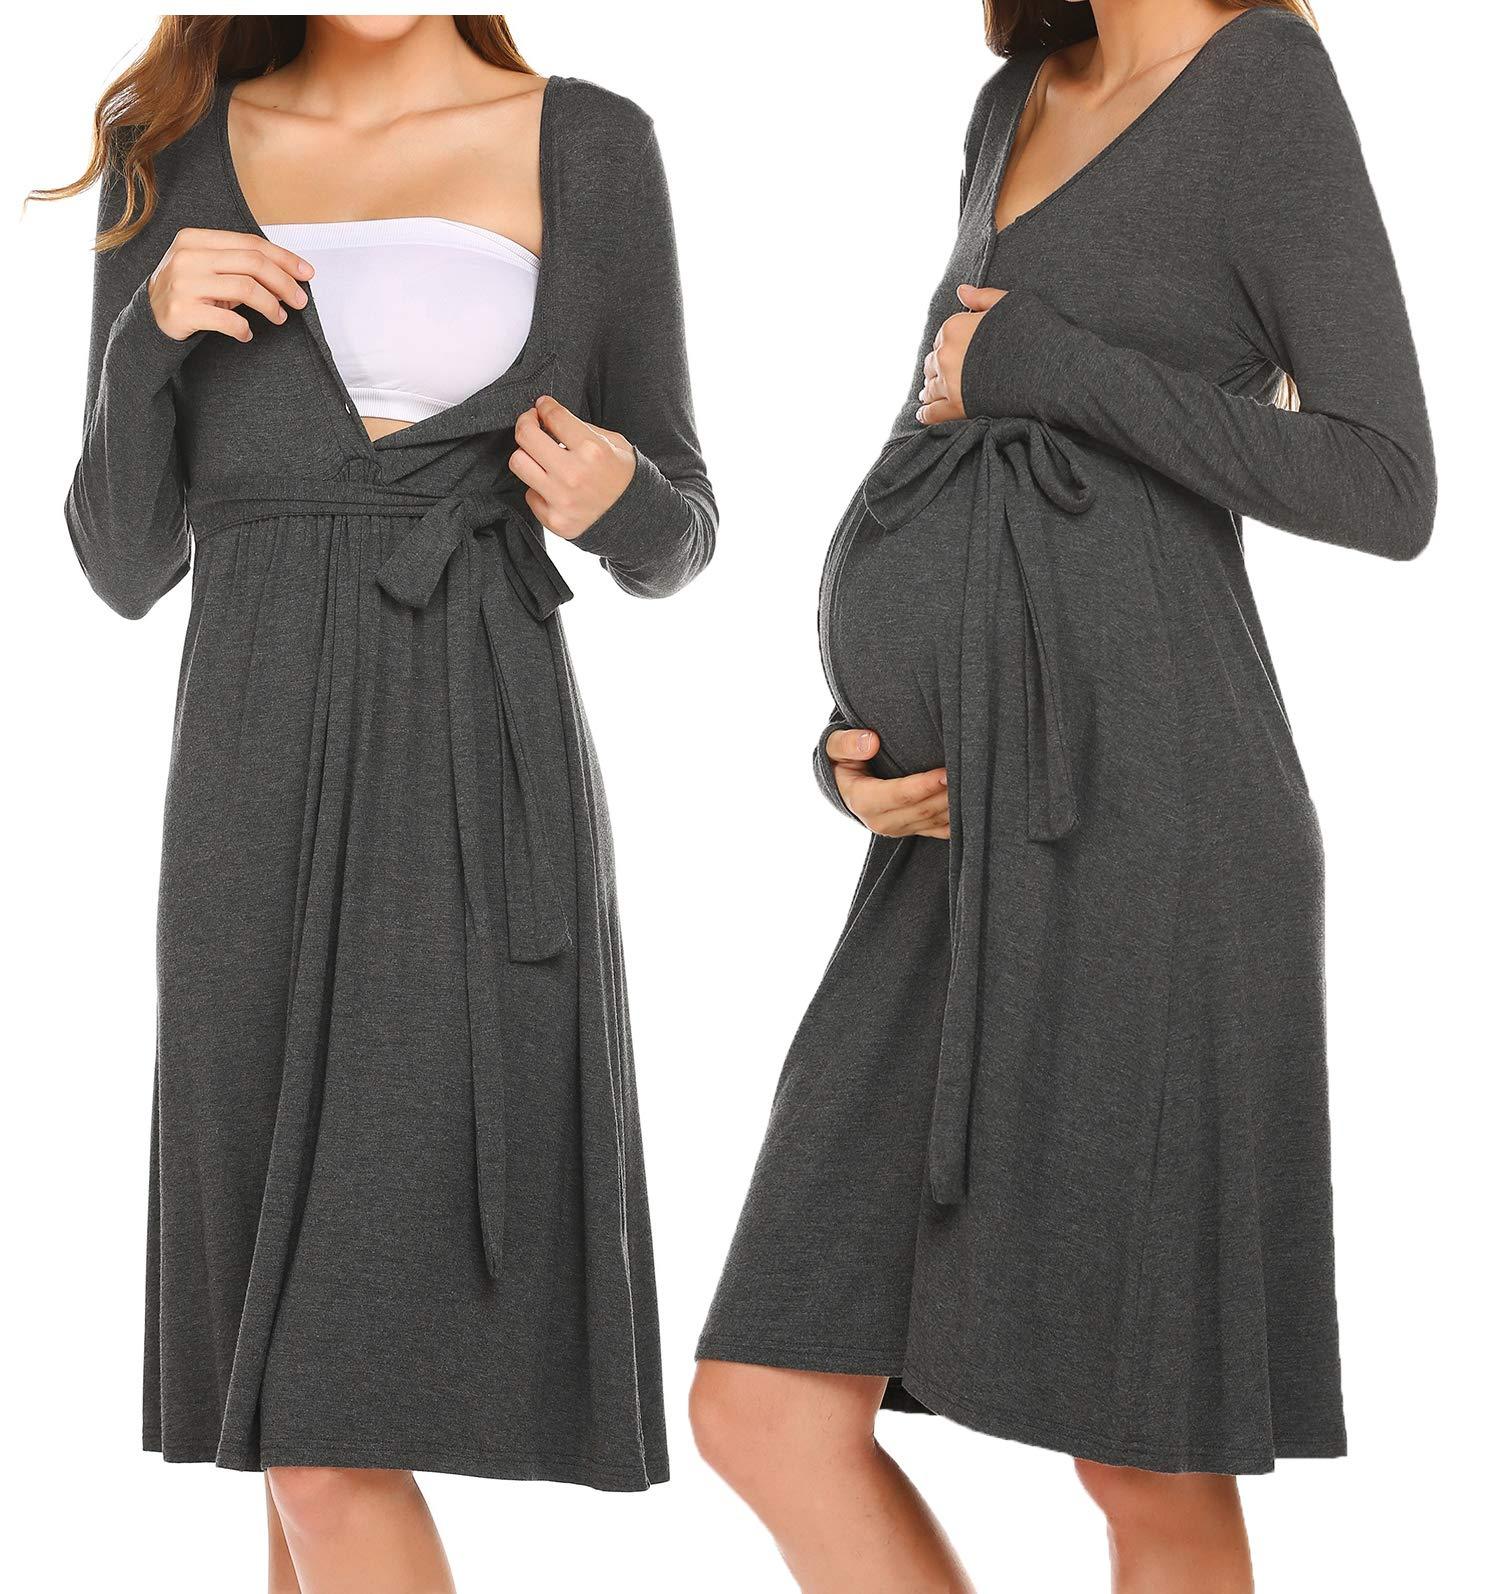 Womens Maternity Nursing//Maternity Dress Nightgown Long Sleeve